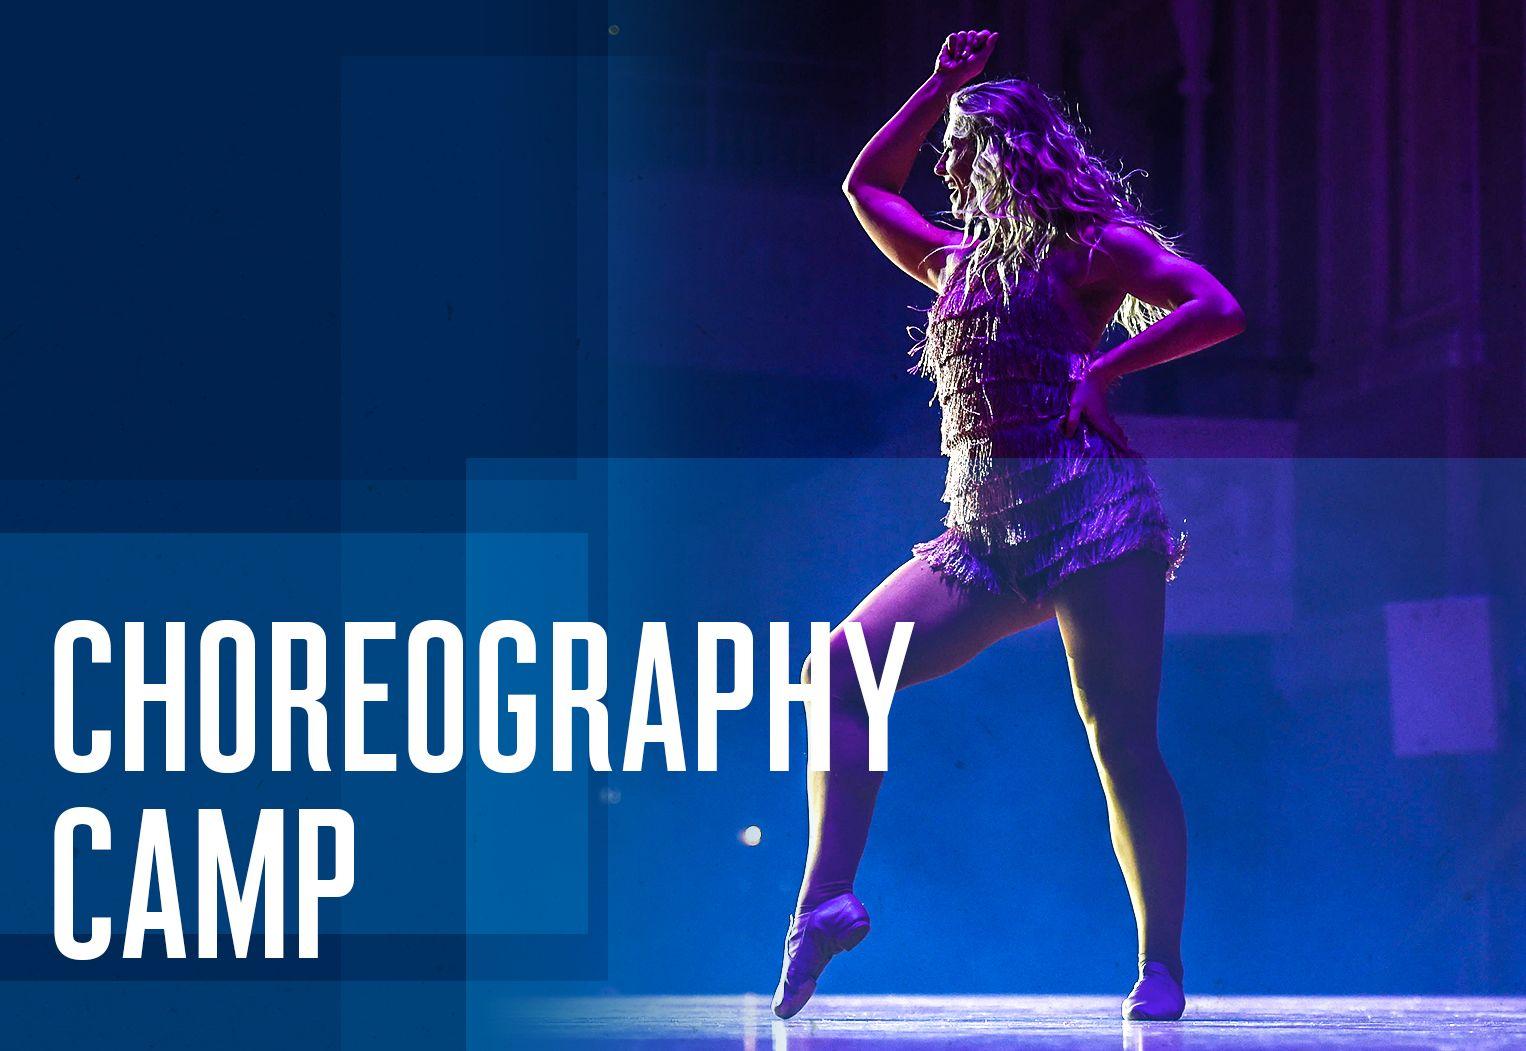 Choreography Camp